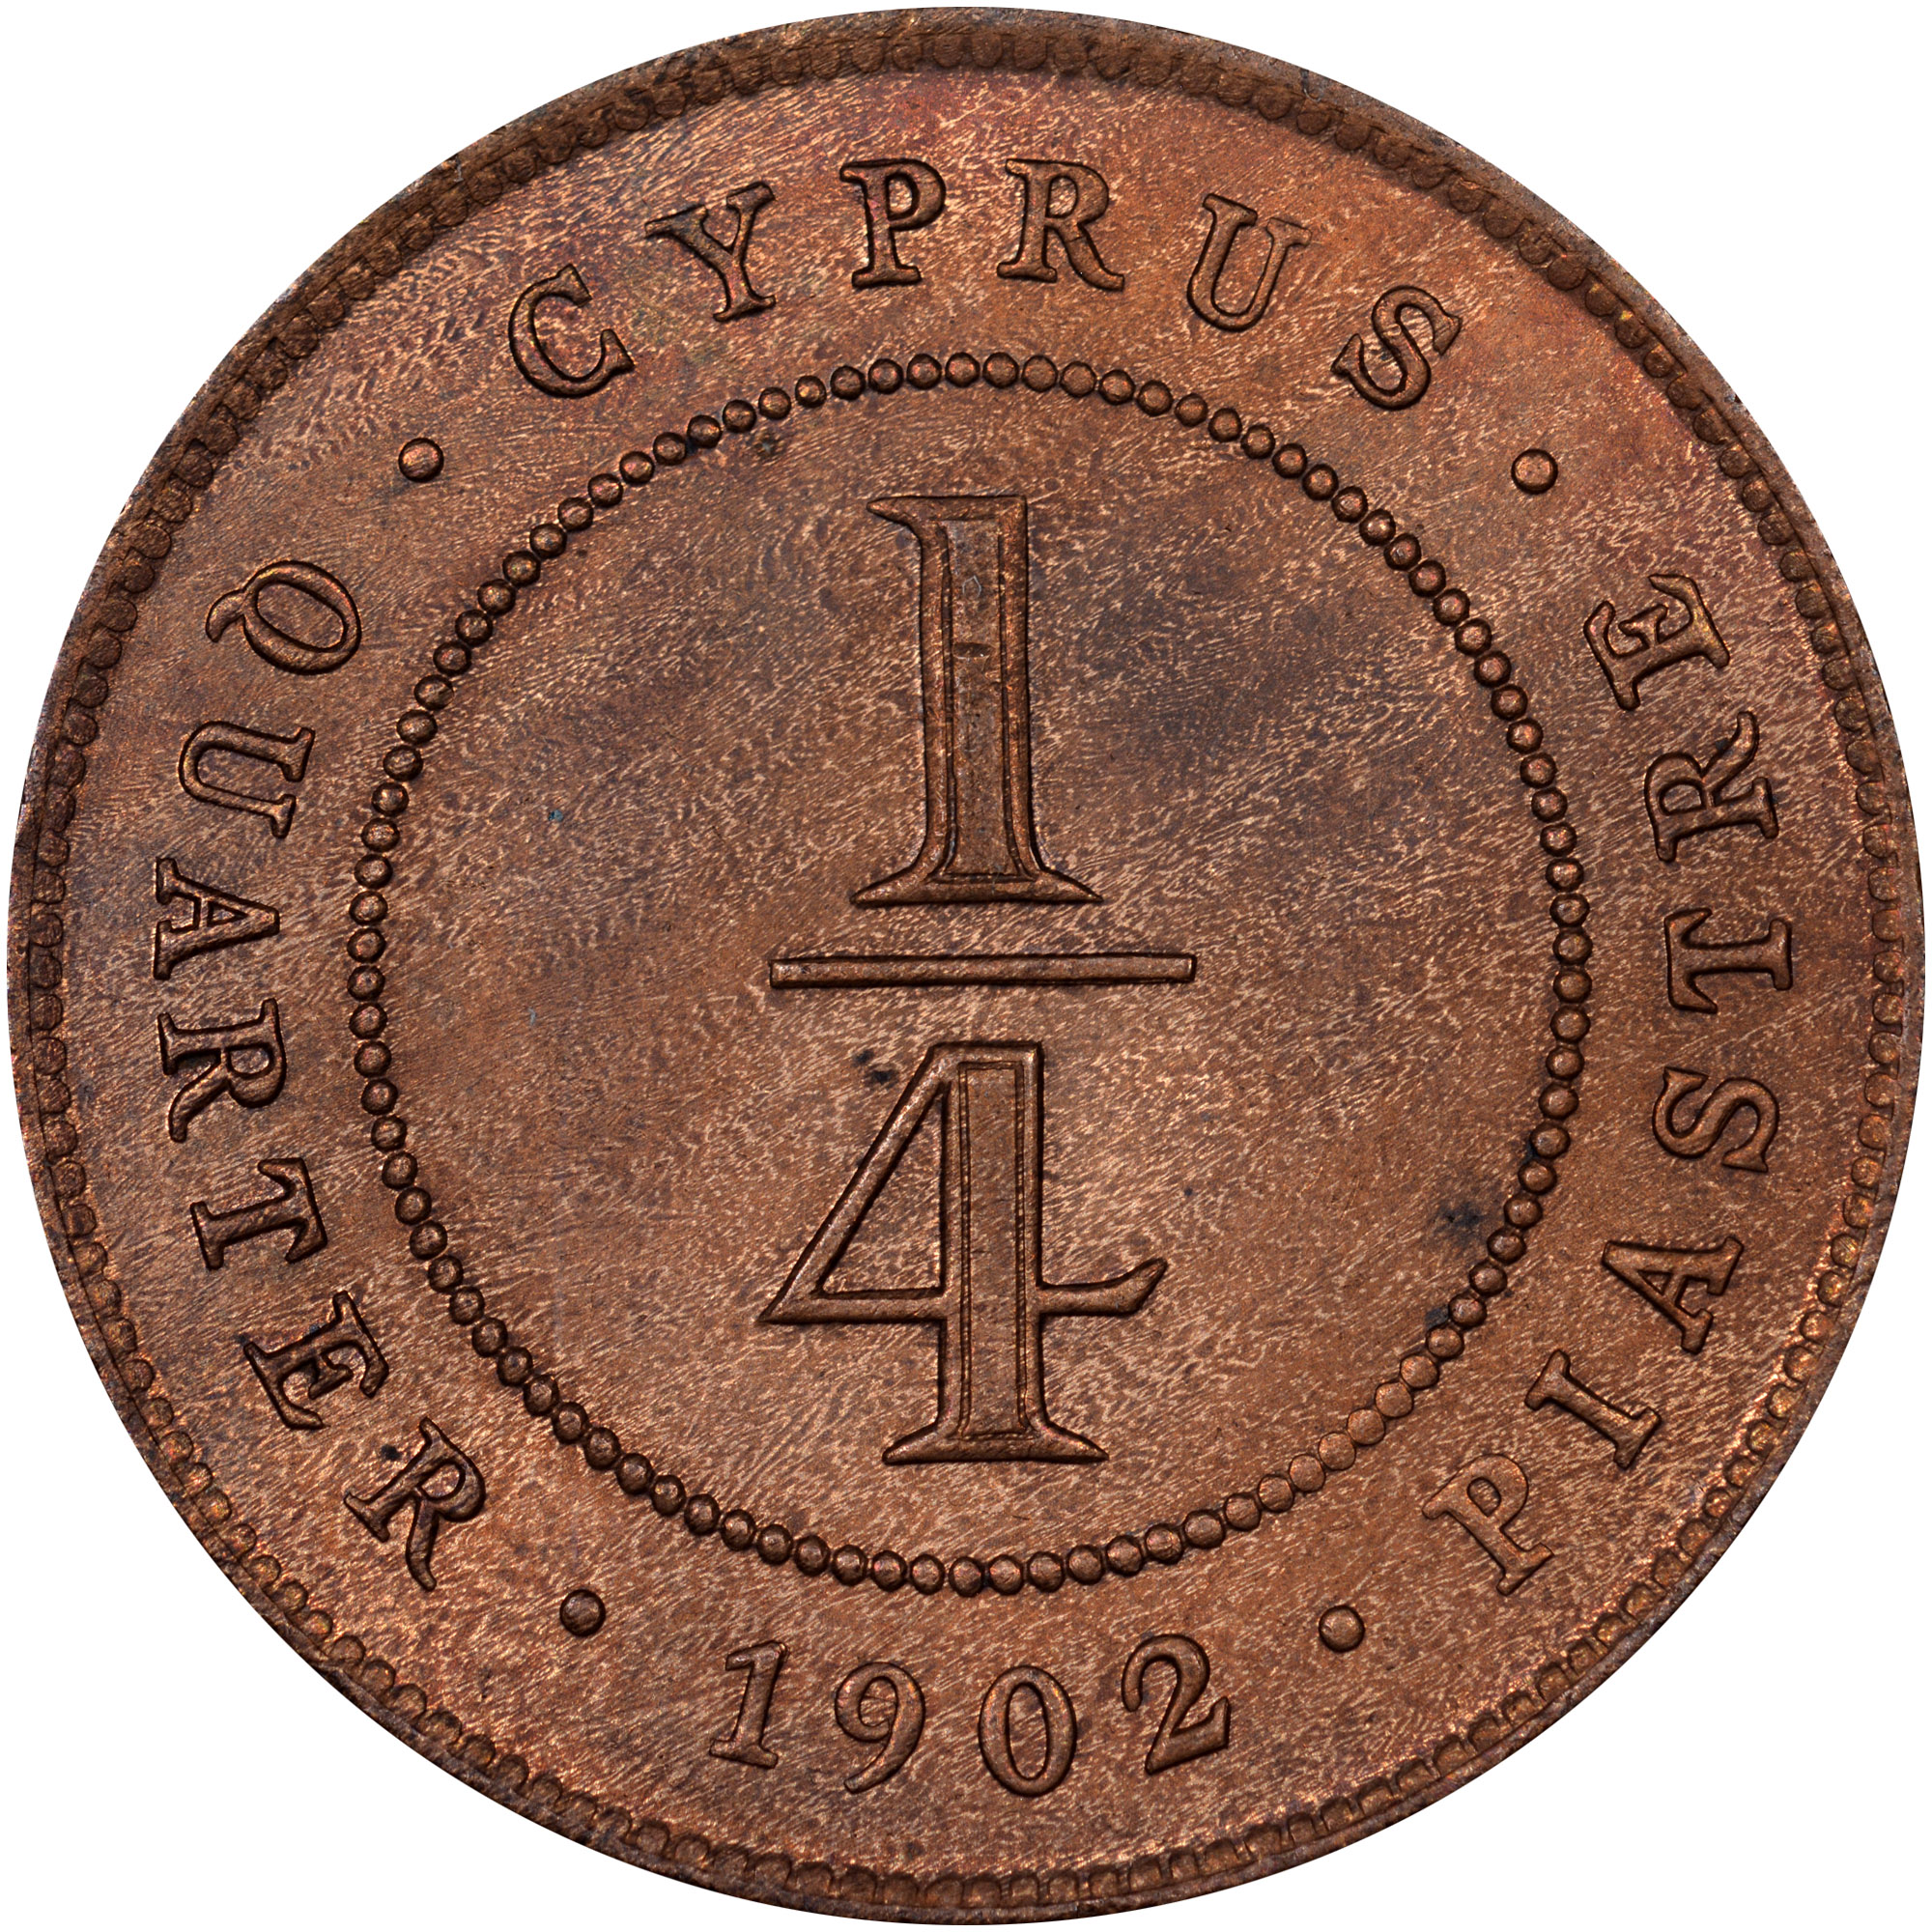 1902-1908 Cyprus 1/4 Piastre reverse